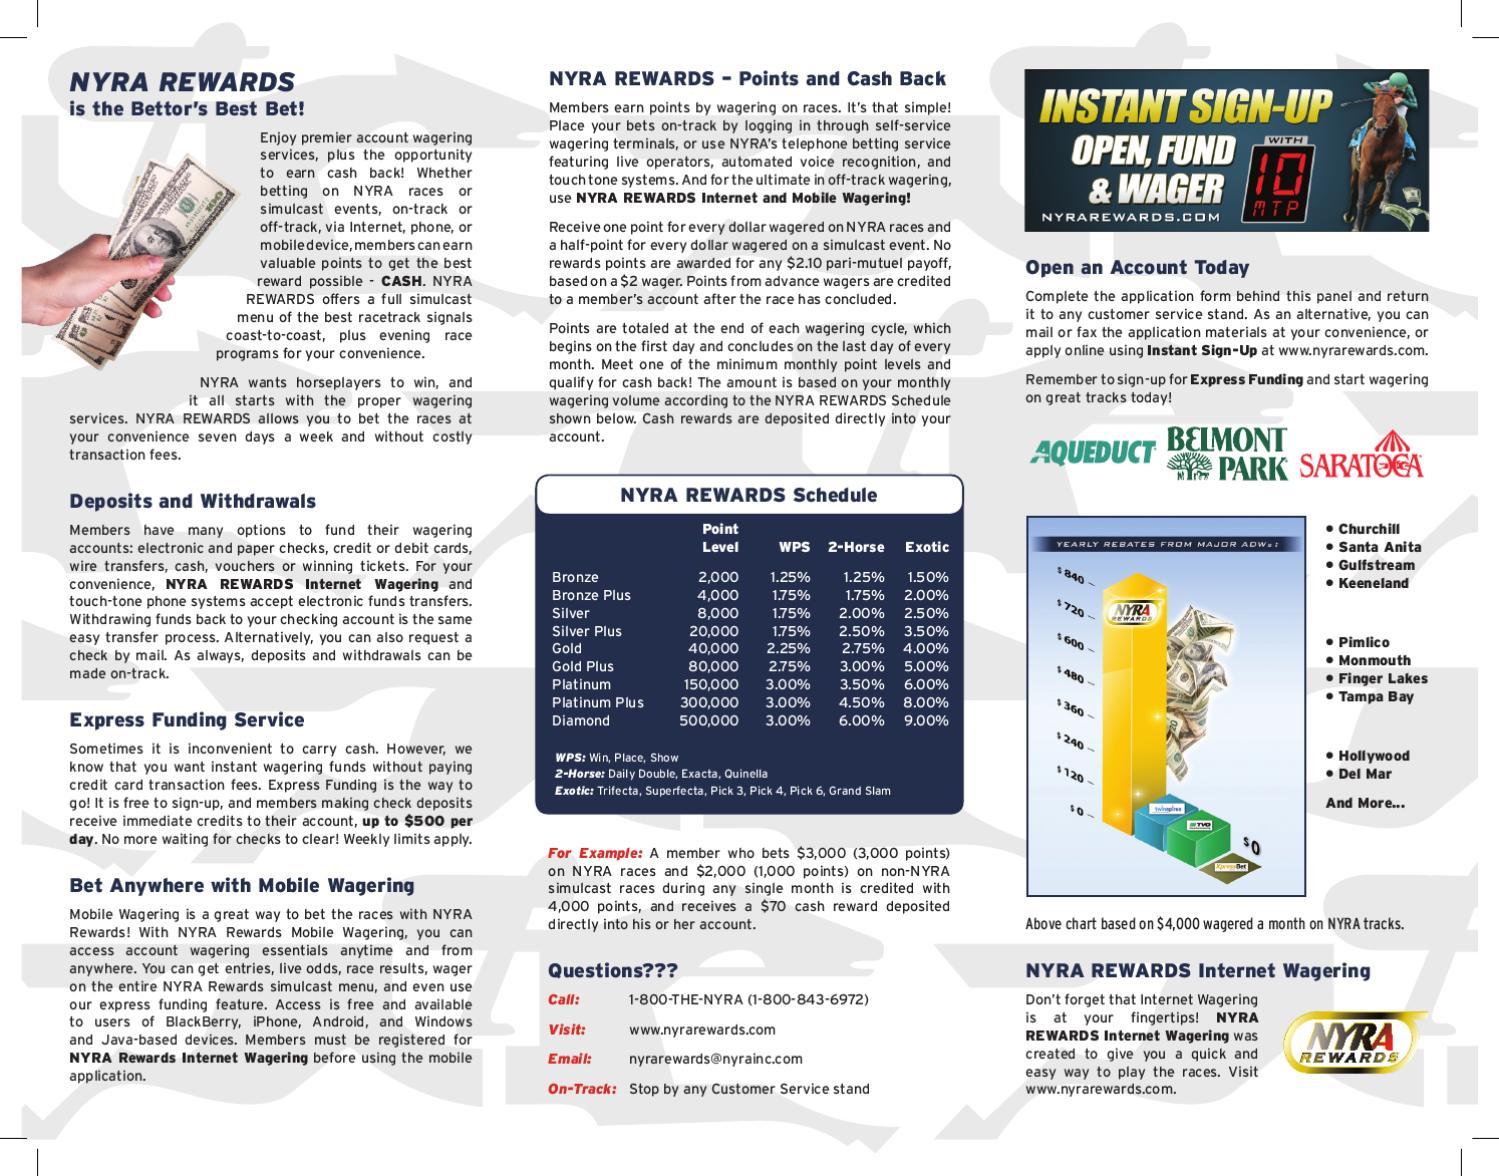 NYRA Rewards Brochure by The New York Racing Association